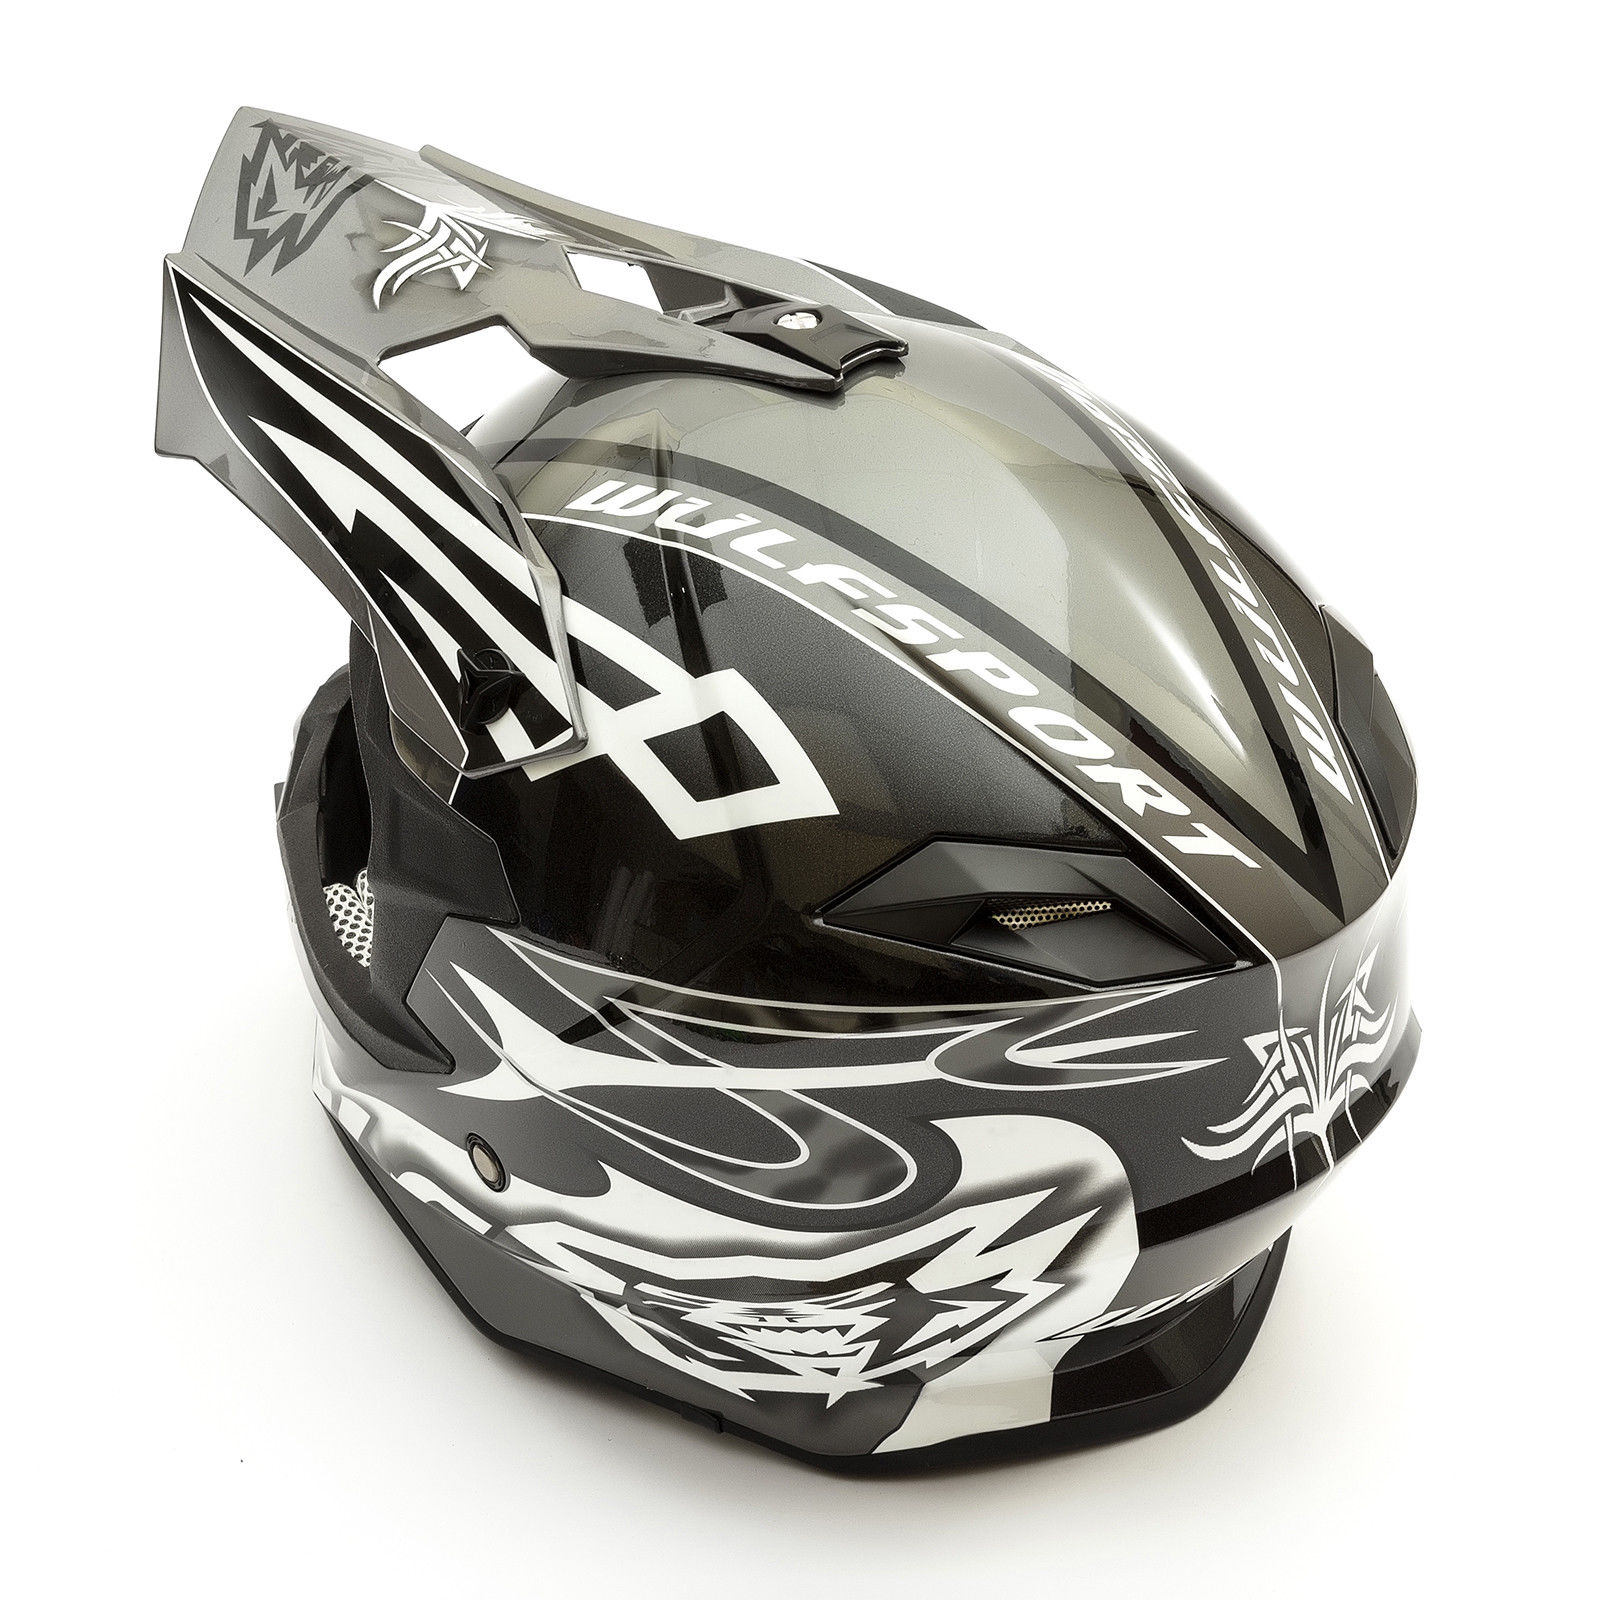 Wulfsport-Adult-Sceptre-Helmets-Motocross-Pitbike-Motorbike-Off-Road-Racing-ATV thumbnail 5